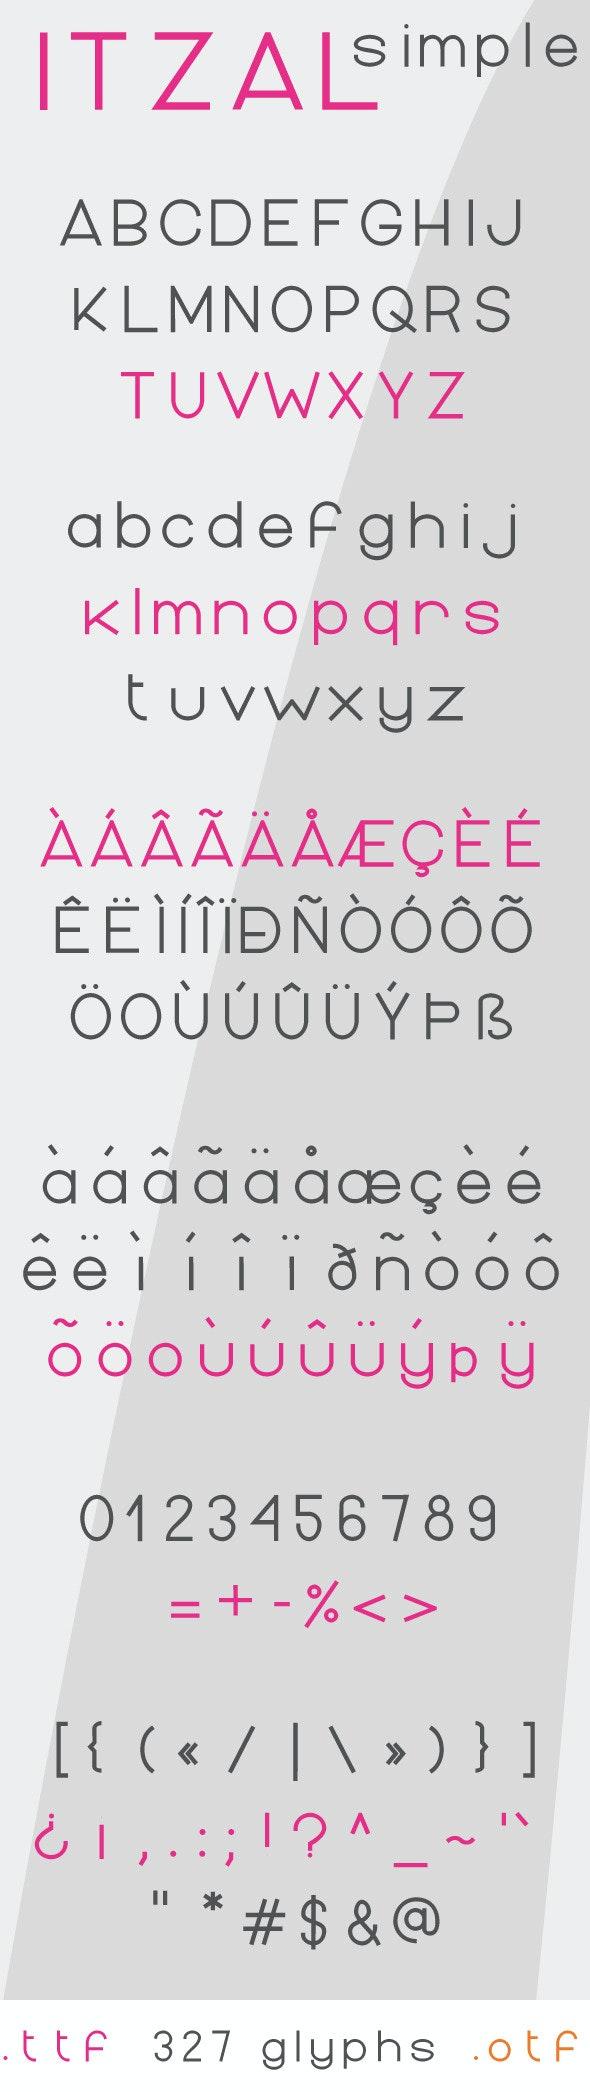 Itzal Simple Regular - Sans-Serif Fonts